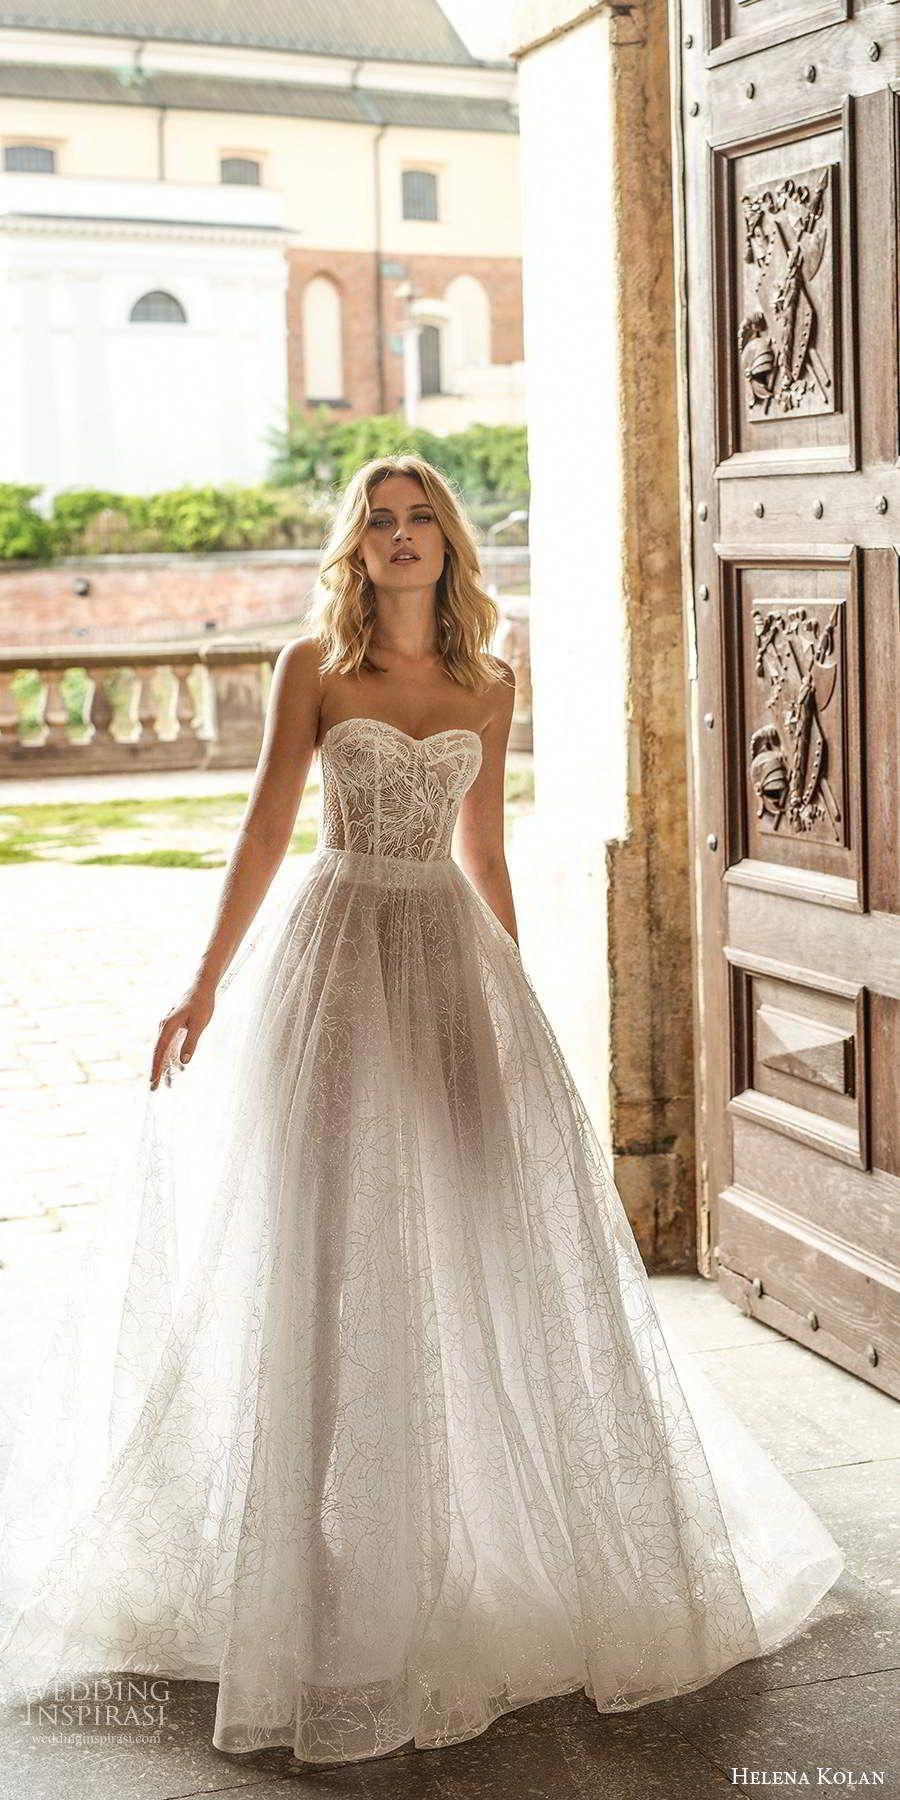 Lace Wedding Dress FROM Beba's MEMORIES OF MADRID in 2020